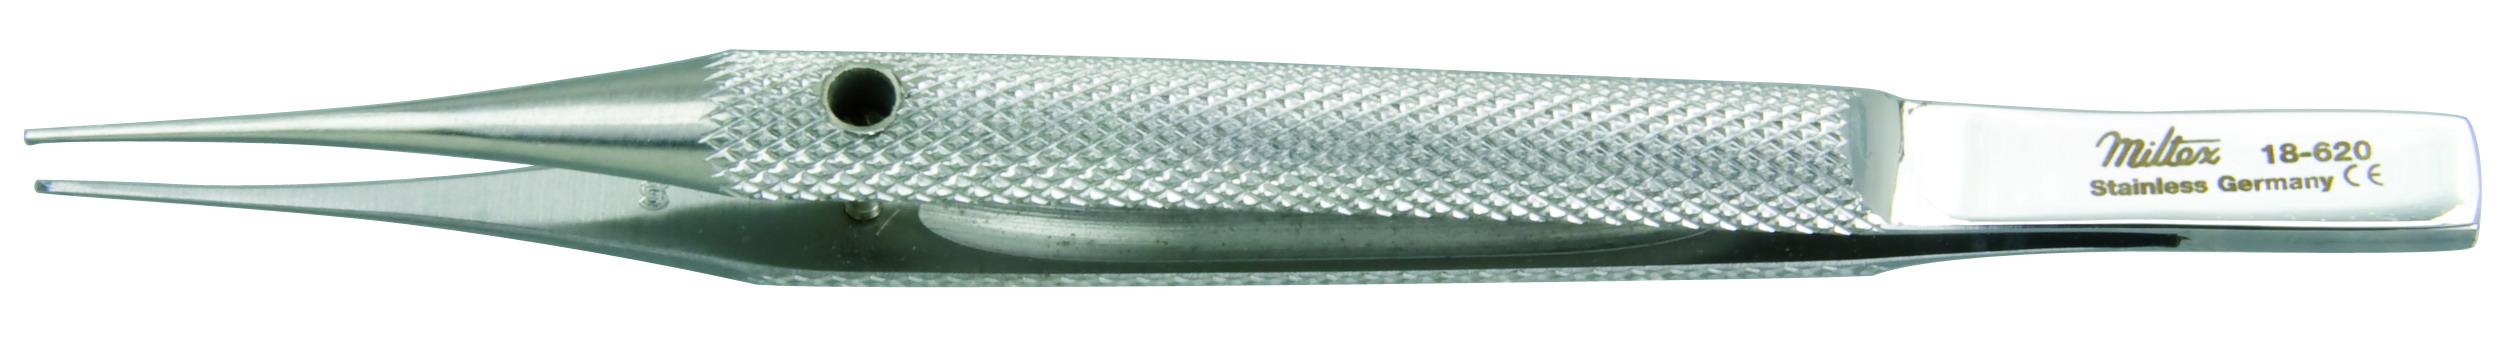 kirby-iris-forceps-4-102-cm-straight-1-x-2-teeth-18-620-miltex.jpg